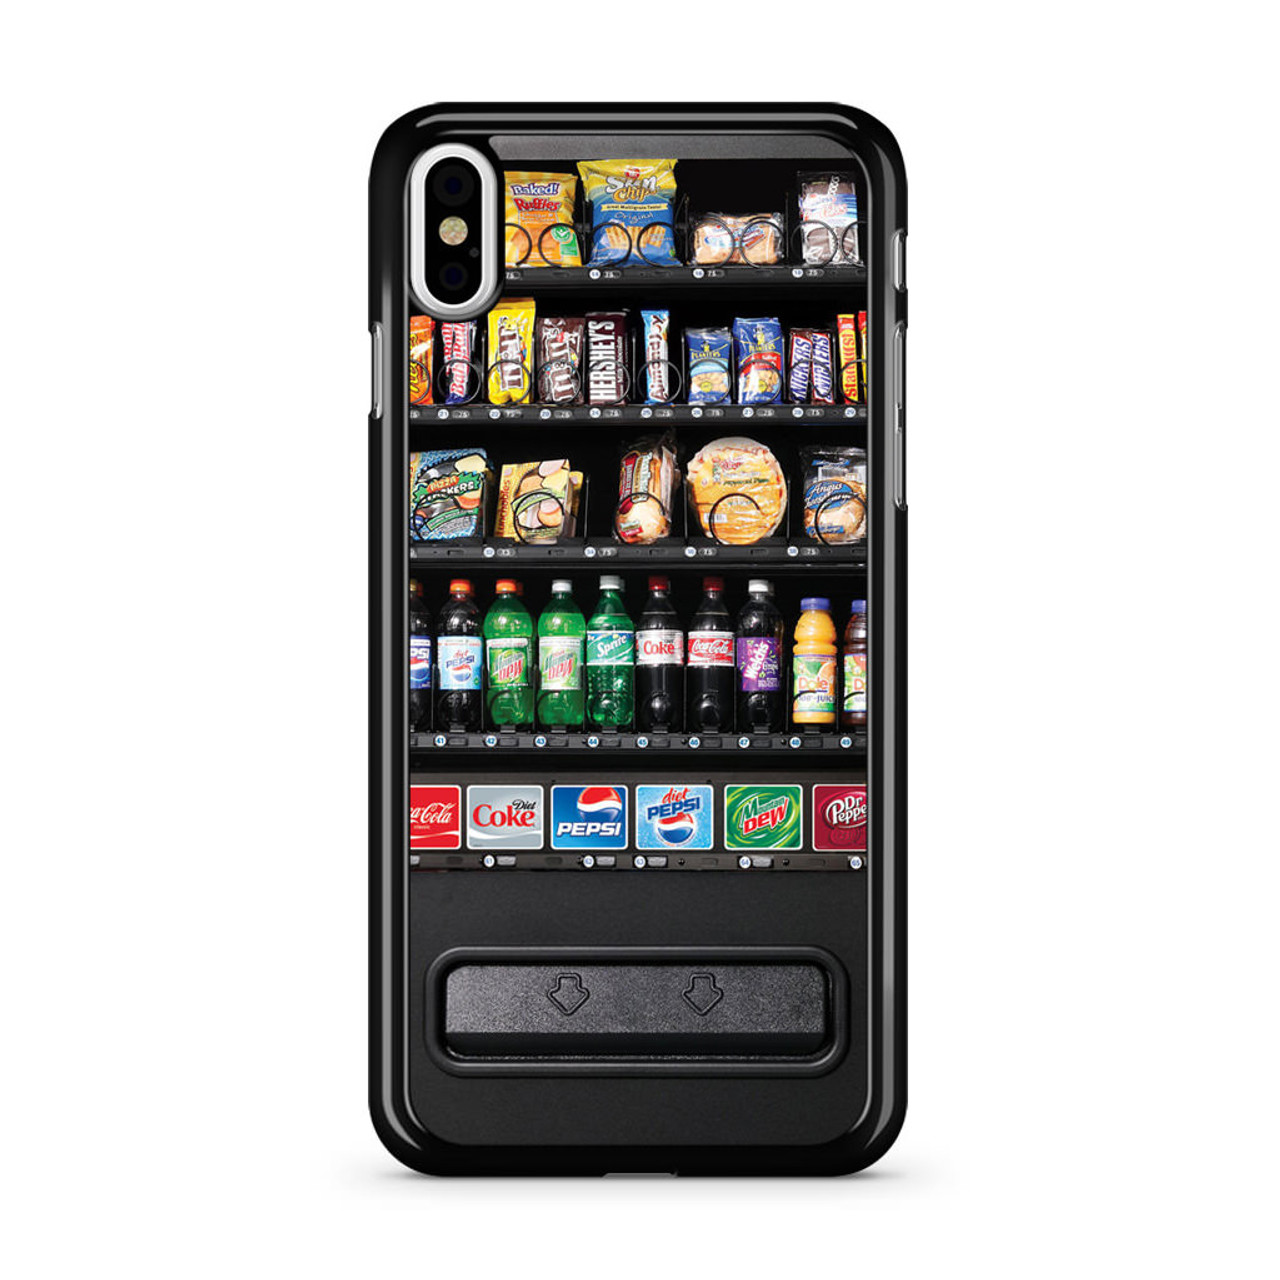 Nyc Subway Map Iphone 5 Case.Vending Machine Iphone X Case